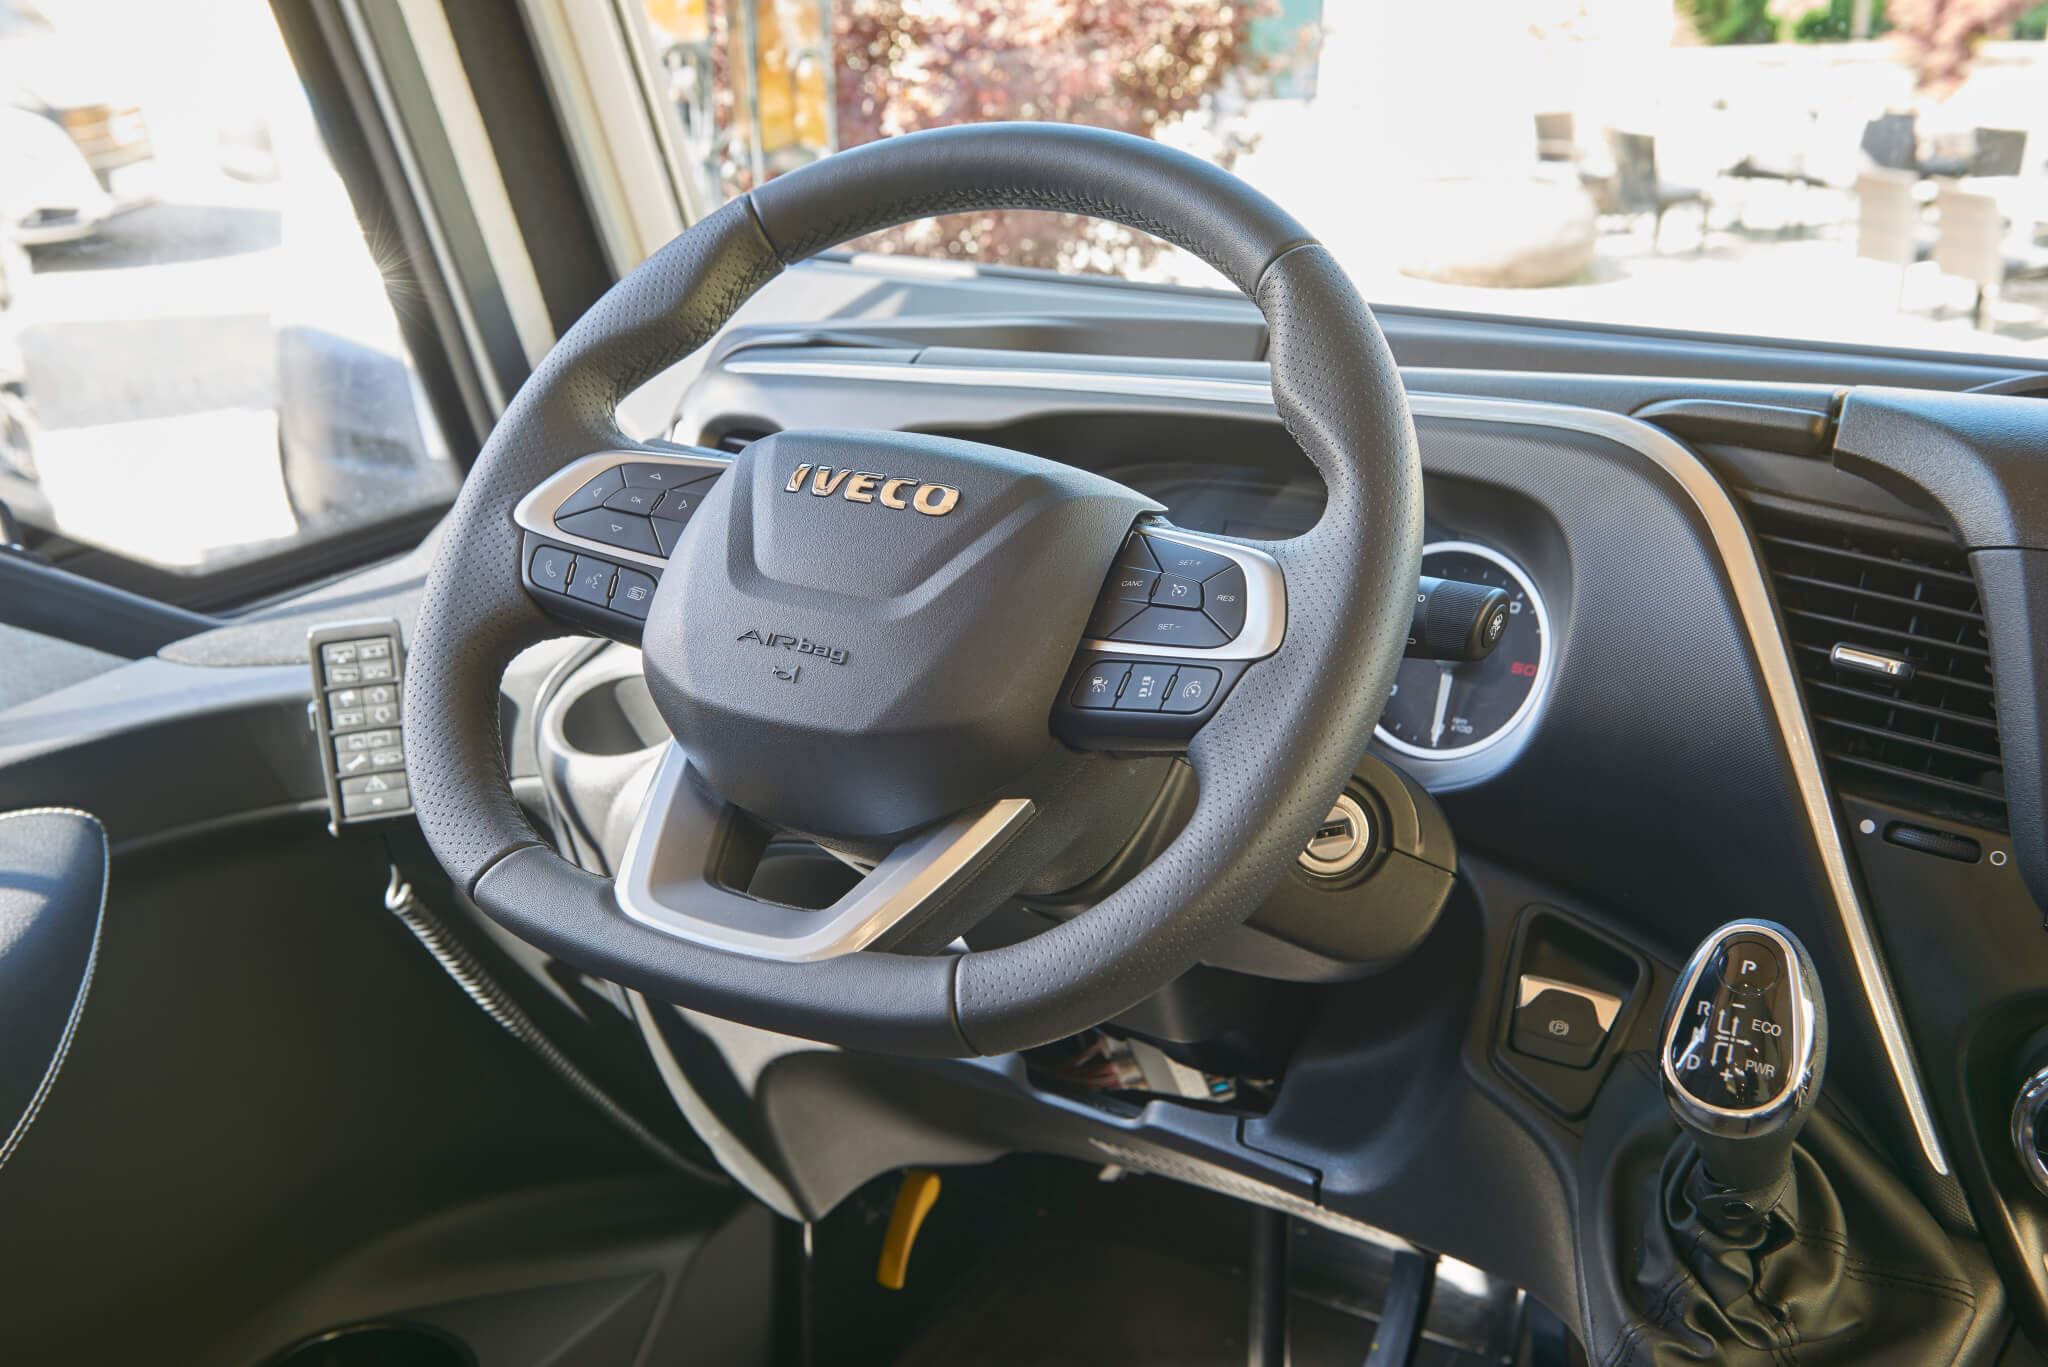 NIESMANN+BISCHOFF - Flair - Flair 920 LW - volant mulitfonctions reglable en hauteur